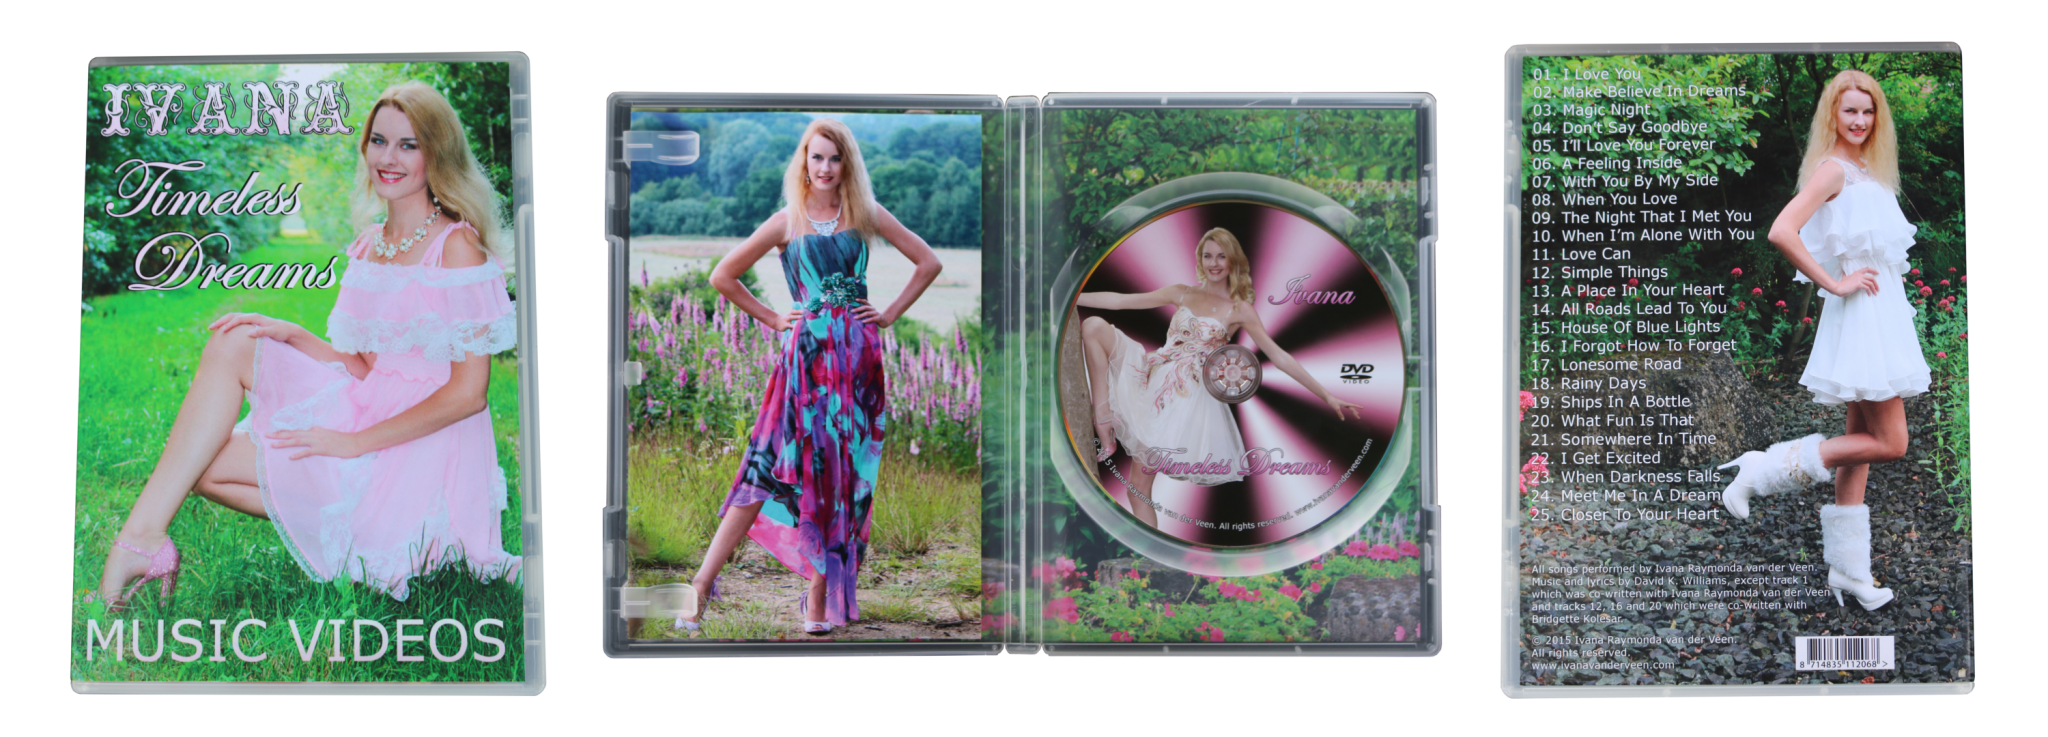 DVD Ivana - Timeless Dreams